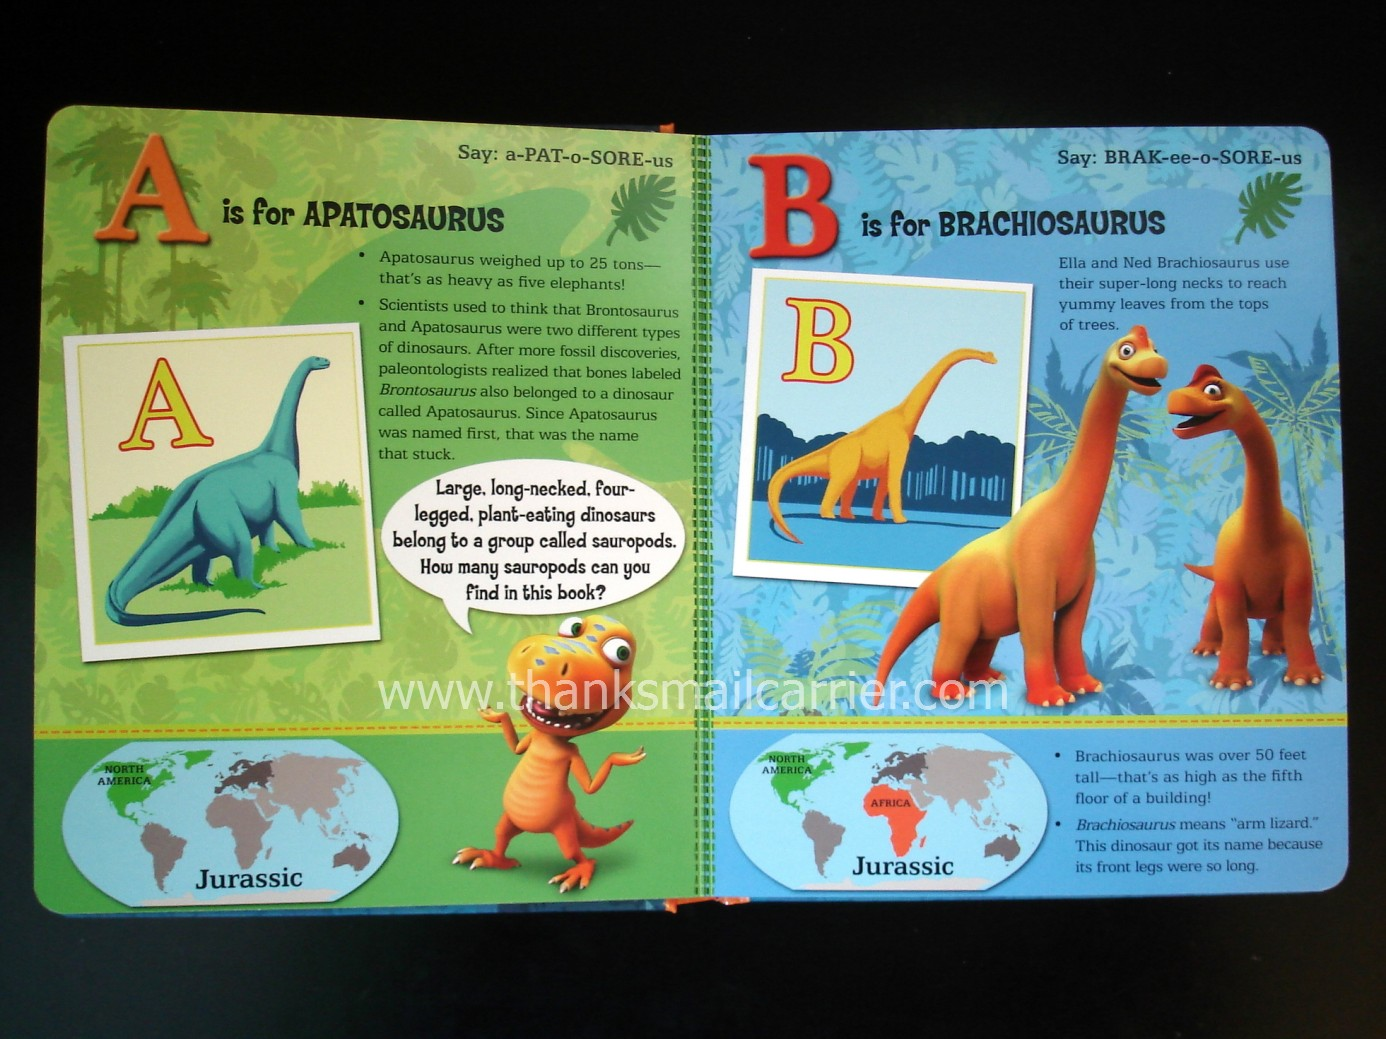 Dinosaur Train Apatosaurus Both of my kids found this